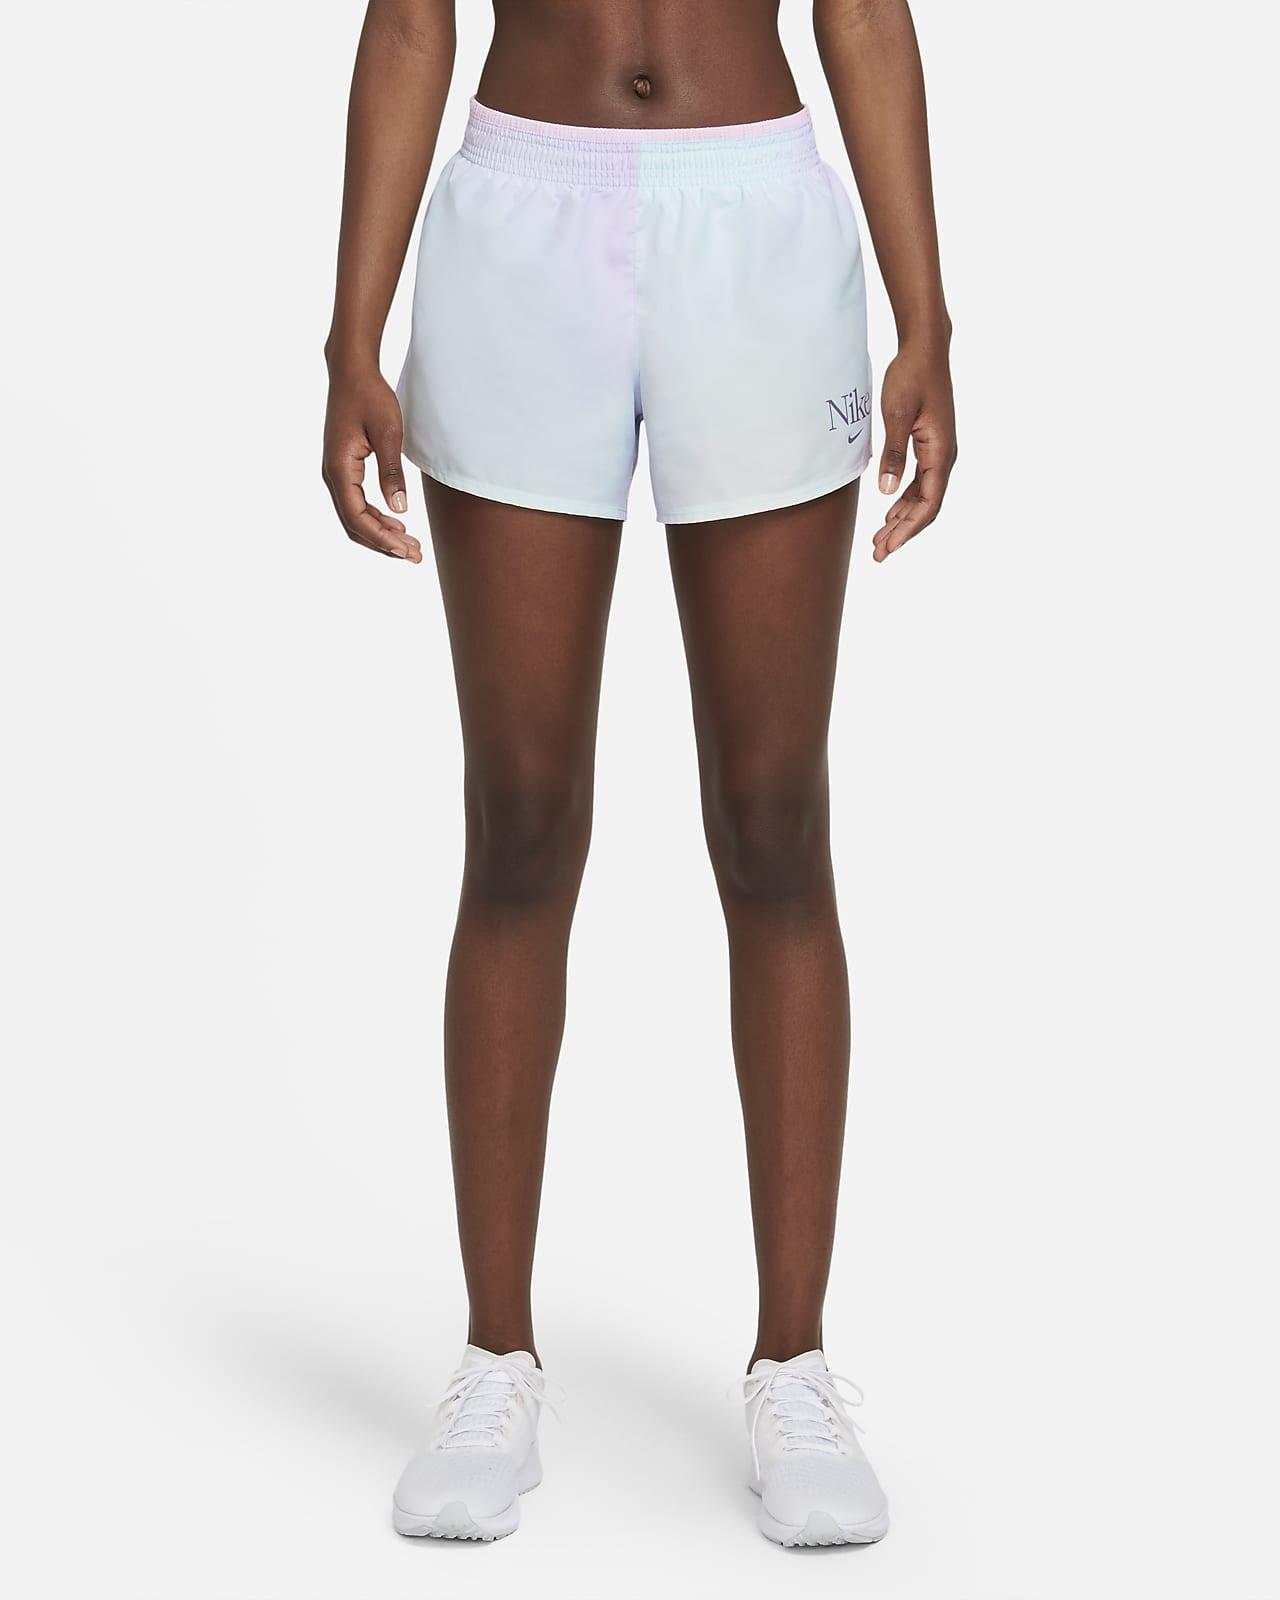 Shorts de running para mujer Nike Dri-FIT Femme 10K